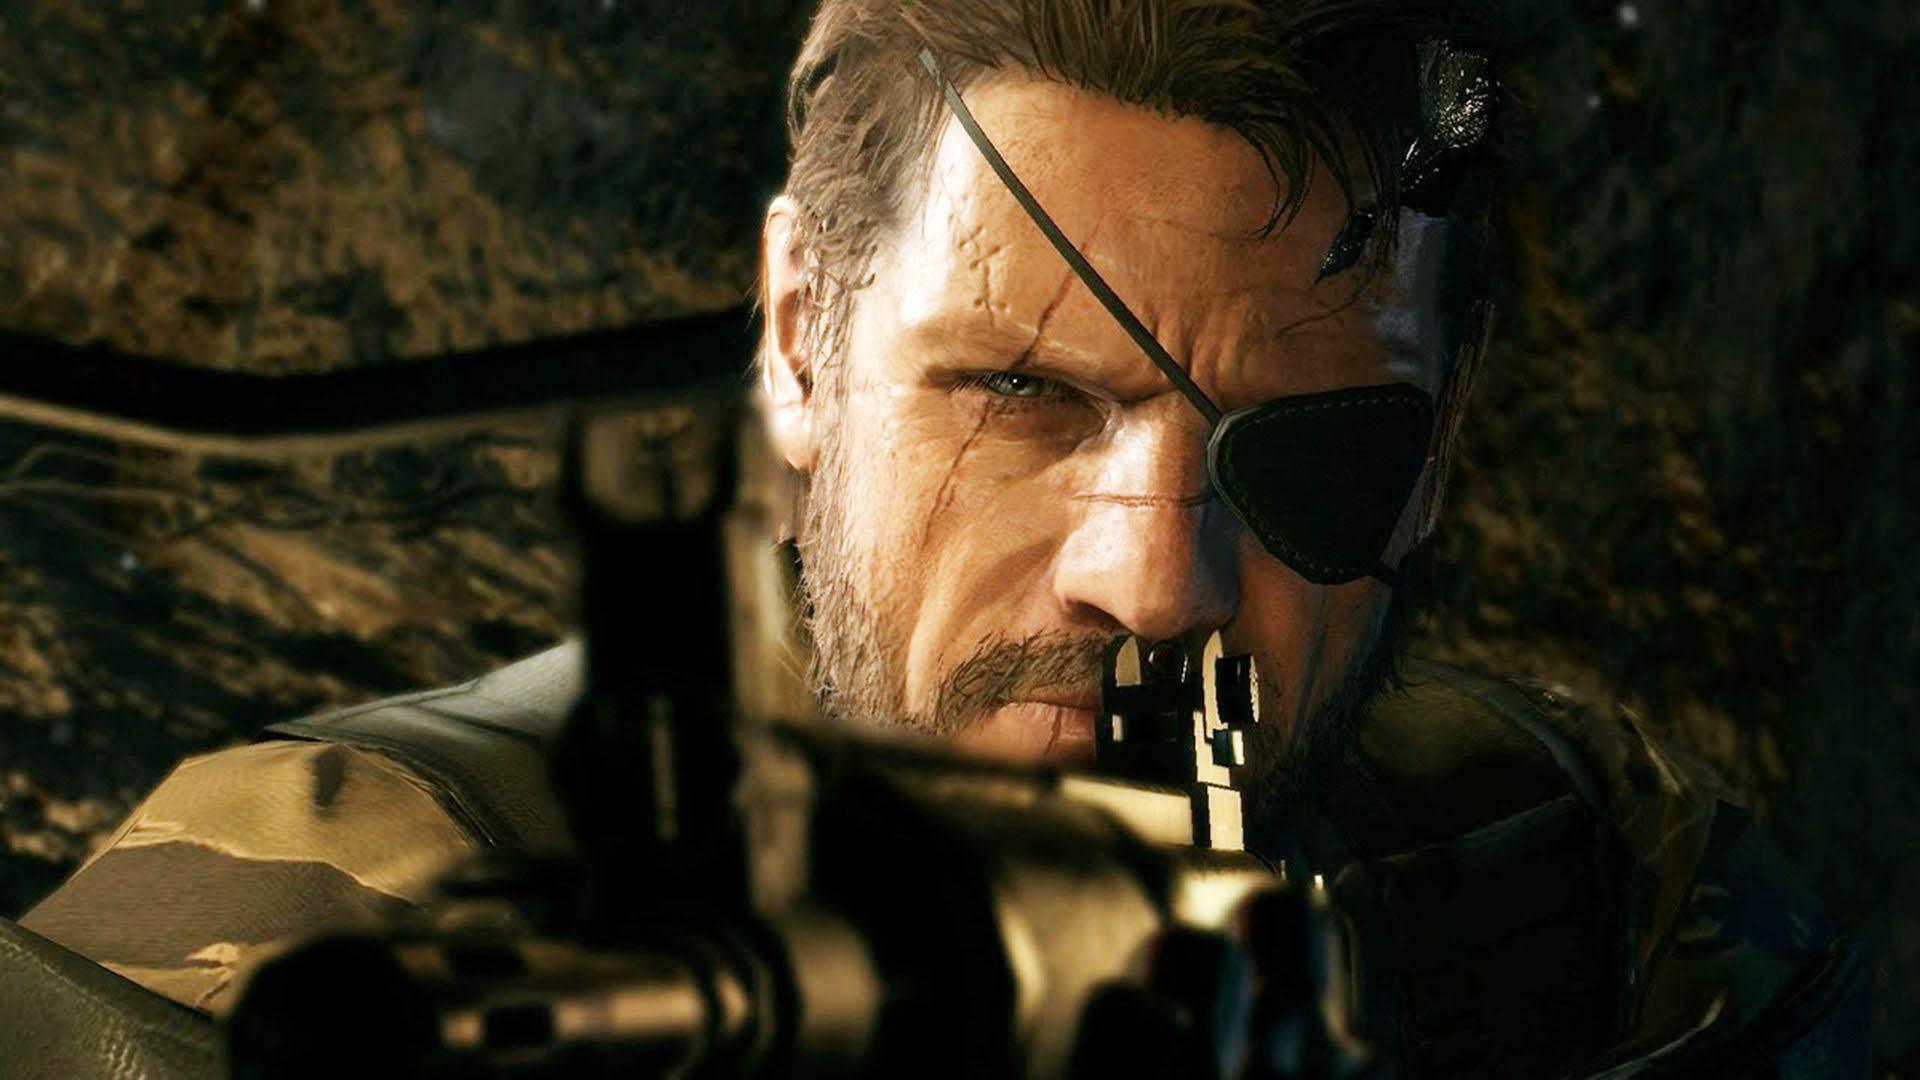 Big Boss aiming – Metal Gear Solid V: The Phantom Pain wallpaper